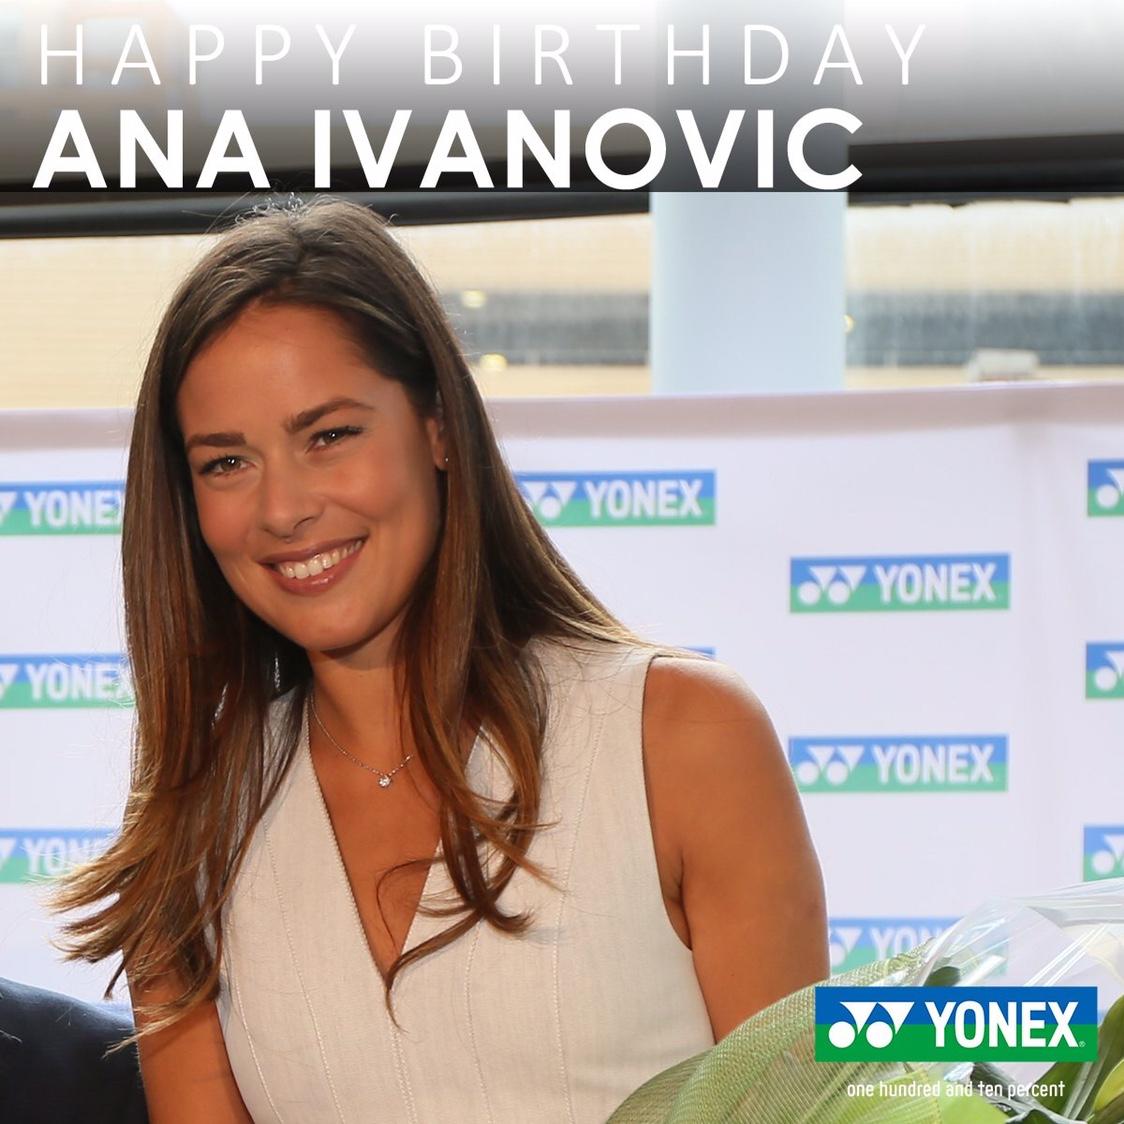 Ana Ivanovic - 2 - Page 38 A33918a3b1745bf4a3273c4b7521f8b9